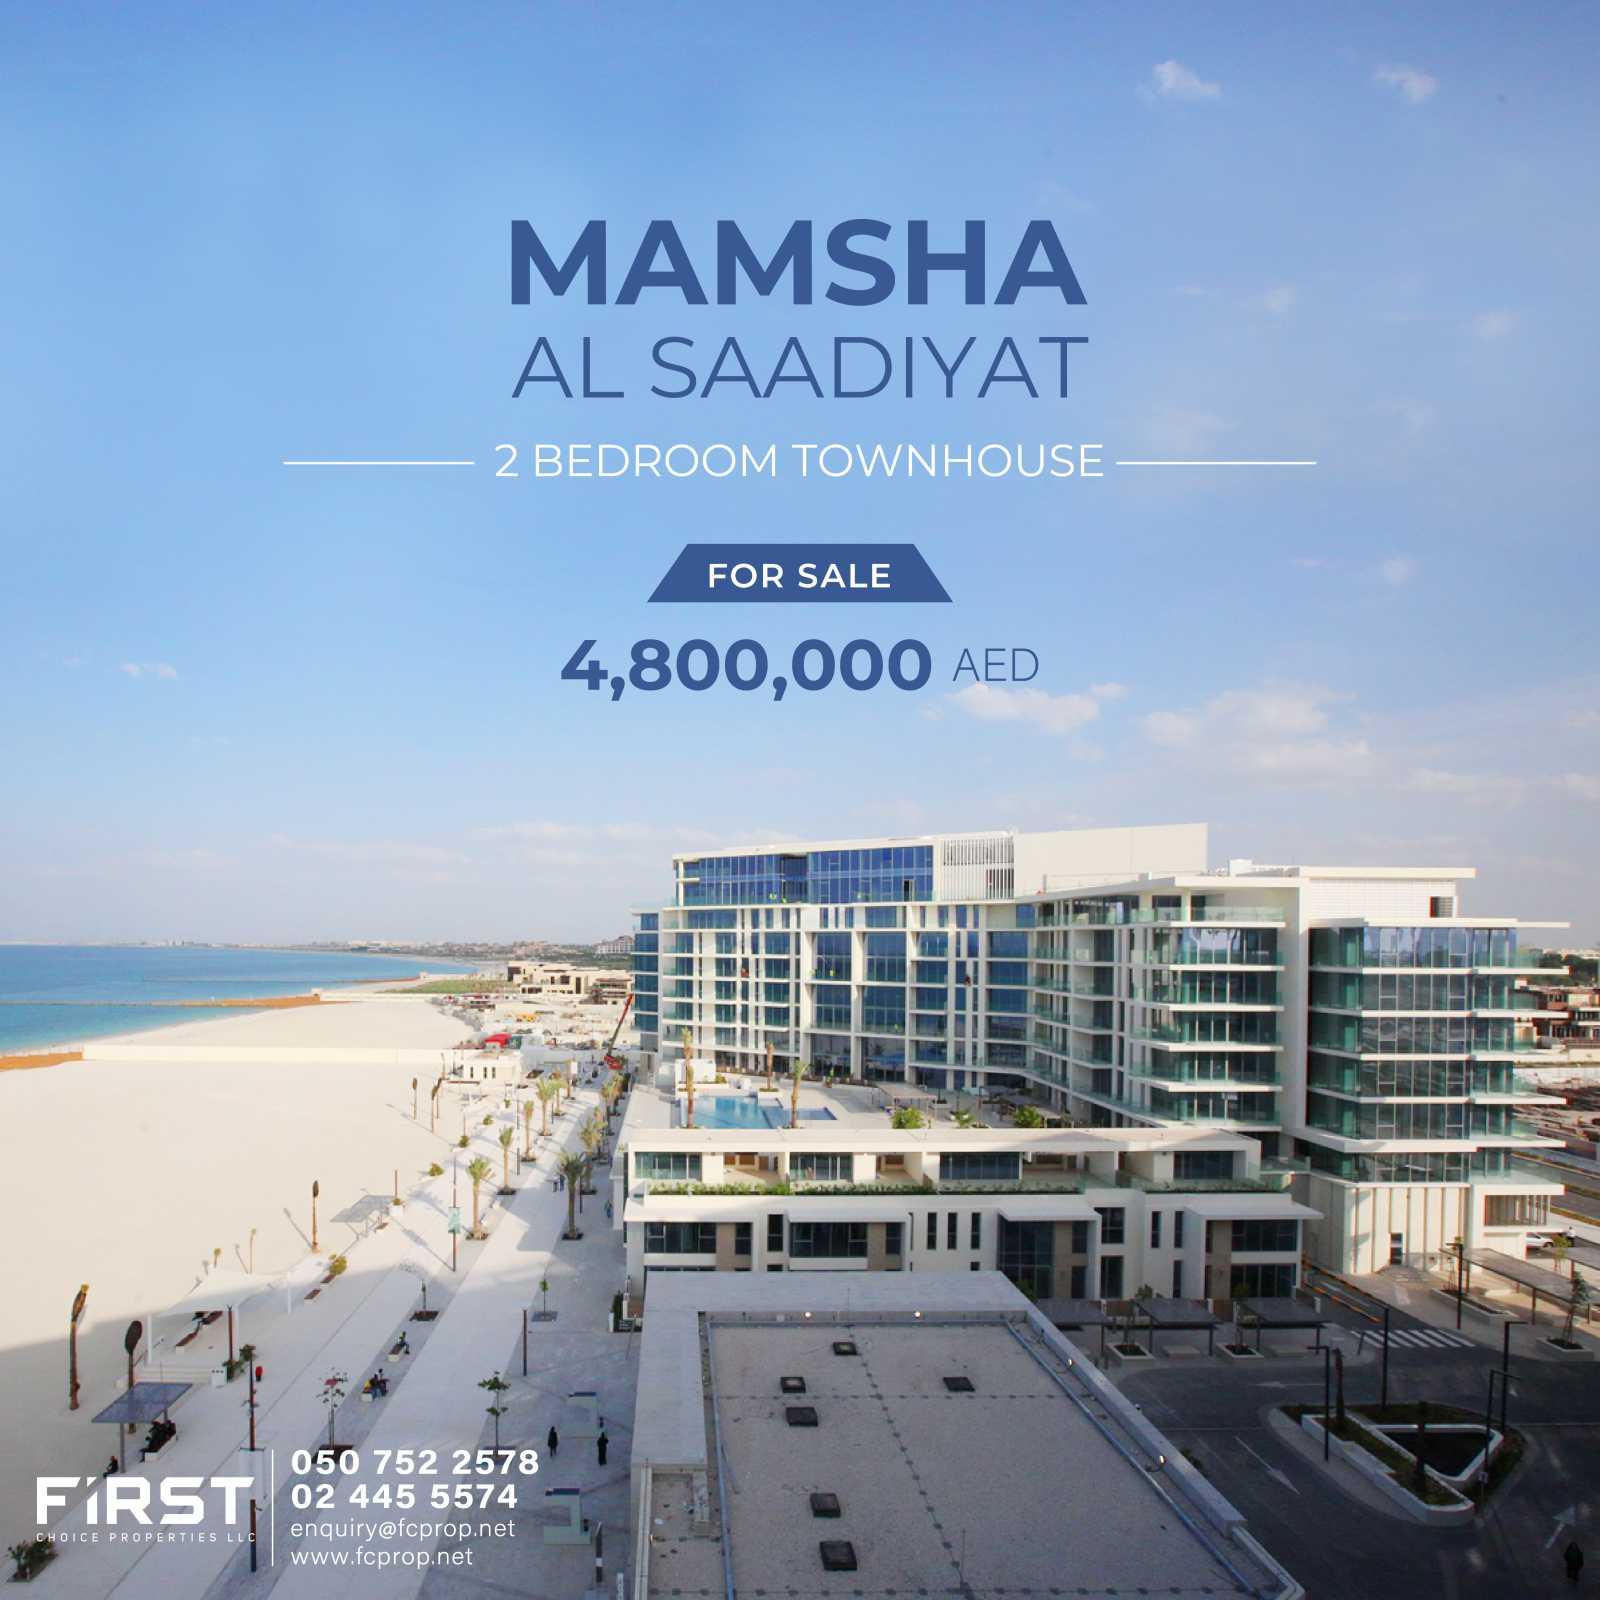 Mamsha Ad-01.jpg